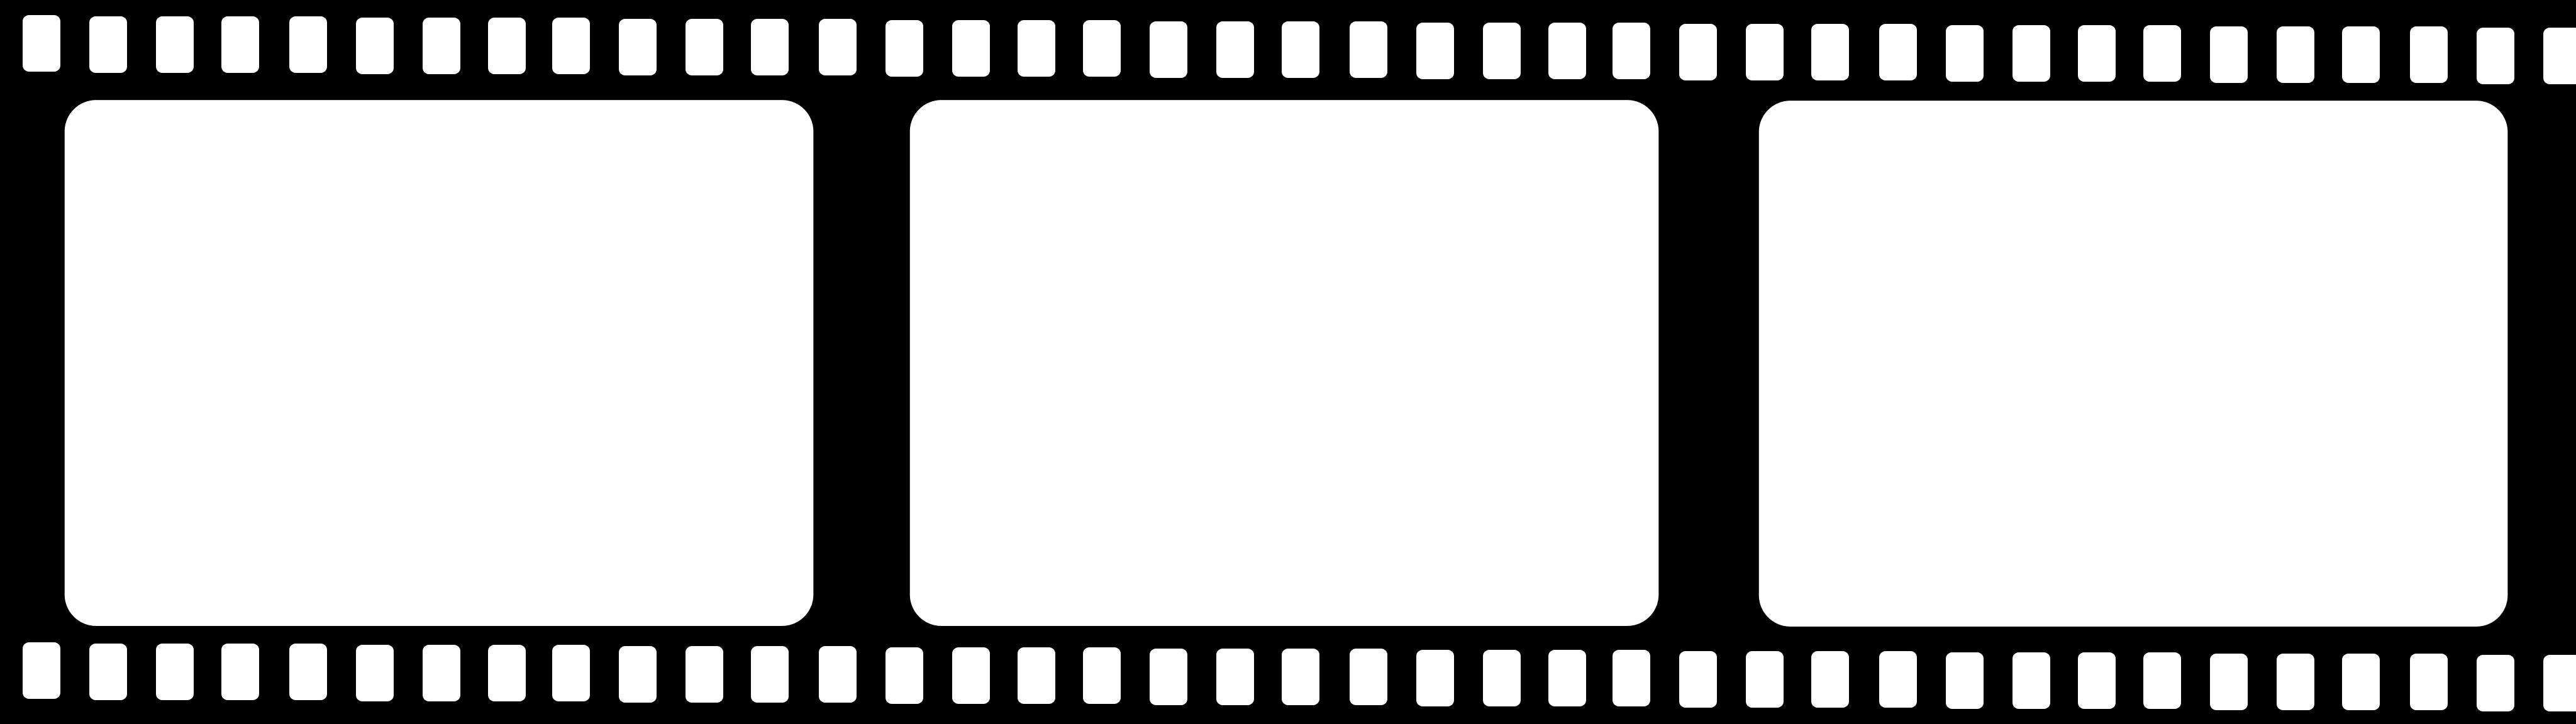 movie reel wallpaper border - photo #43